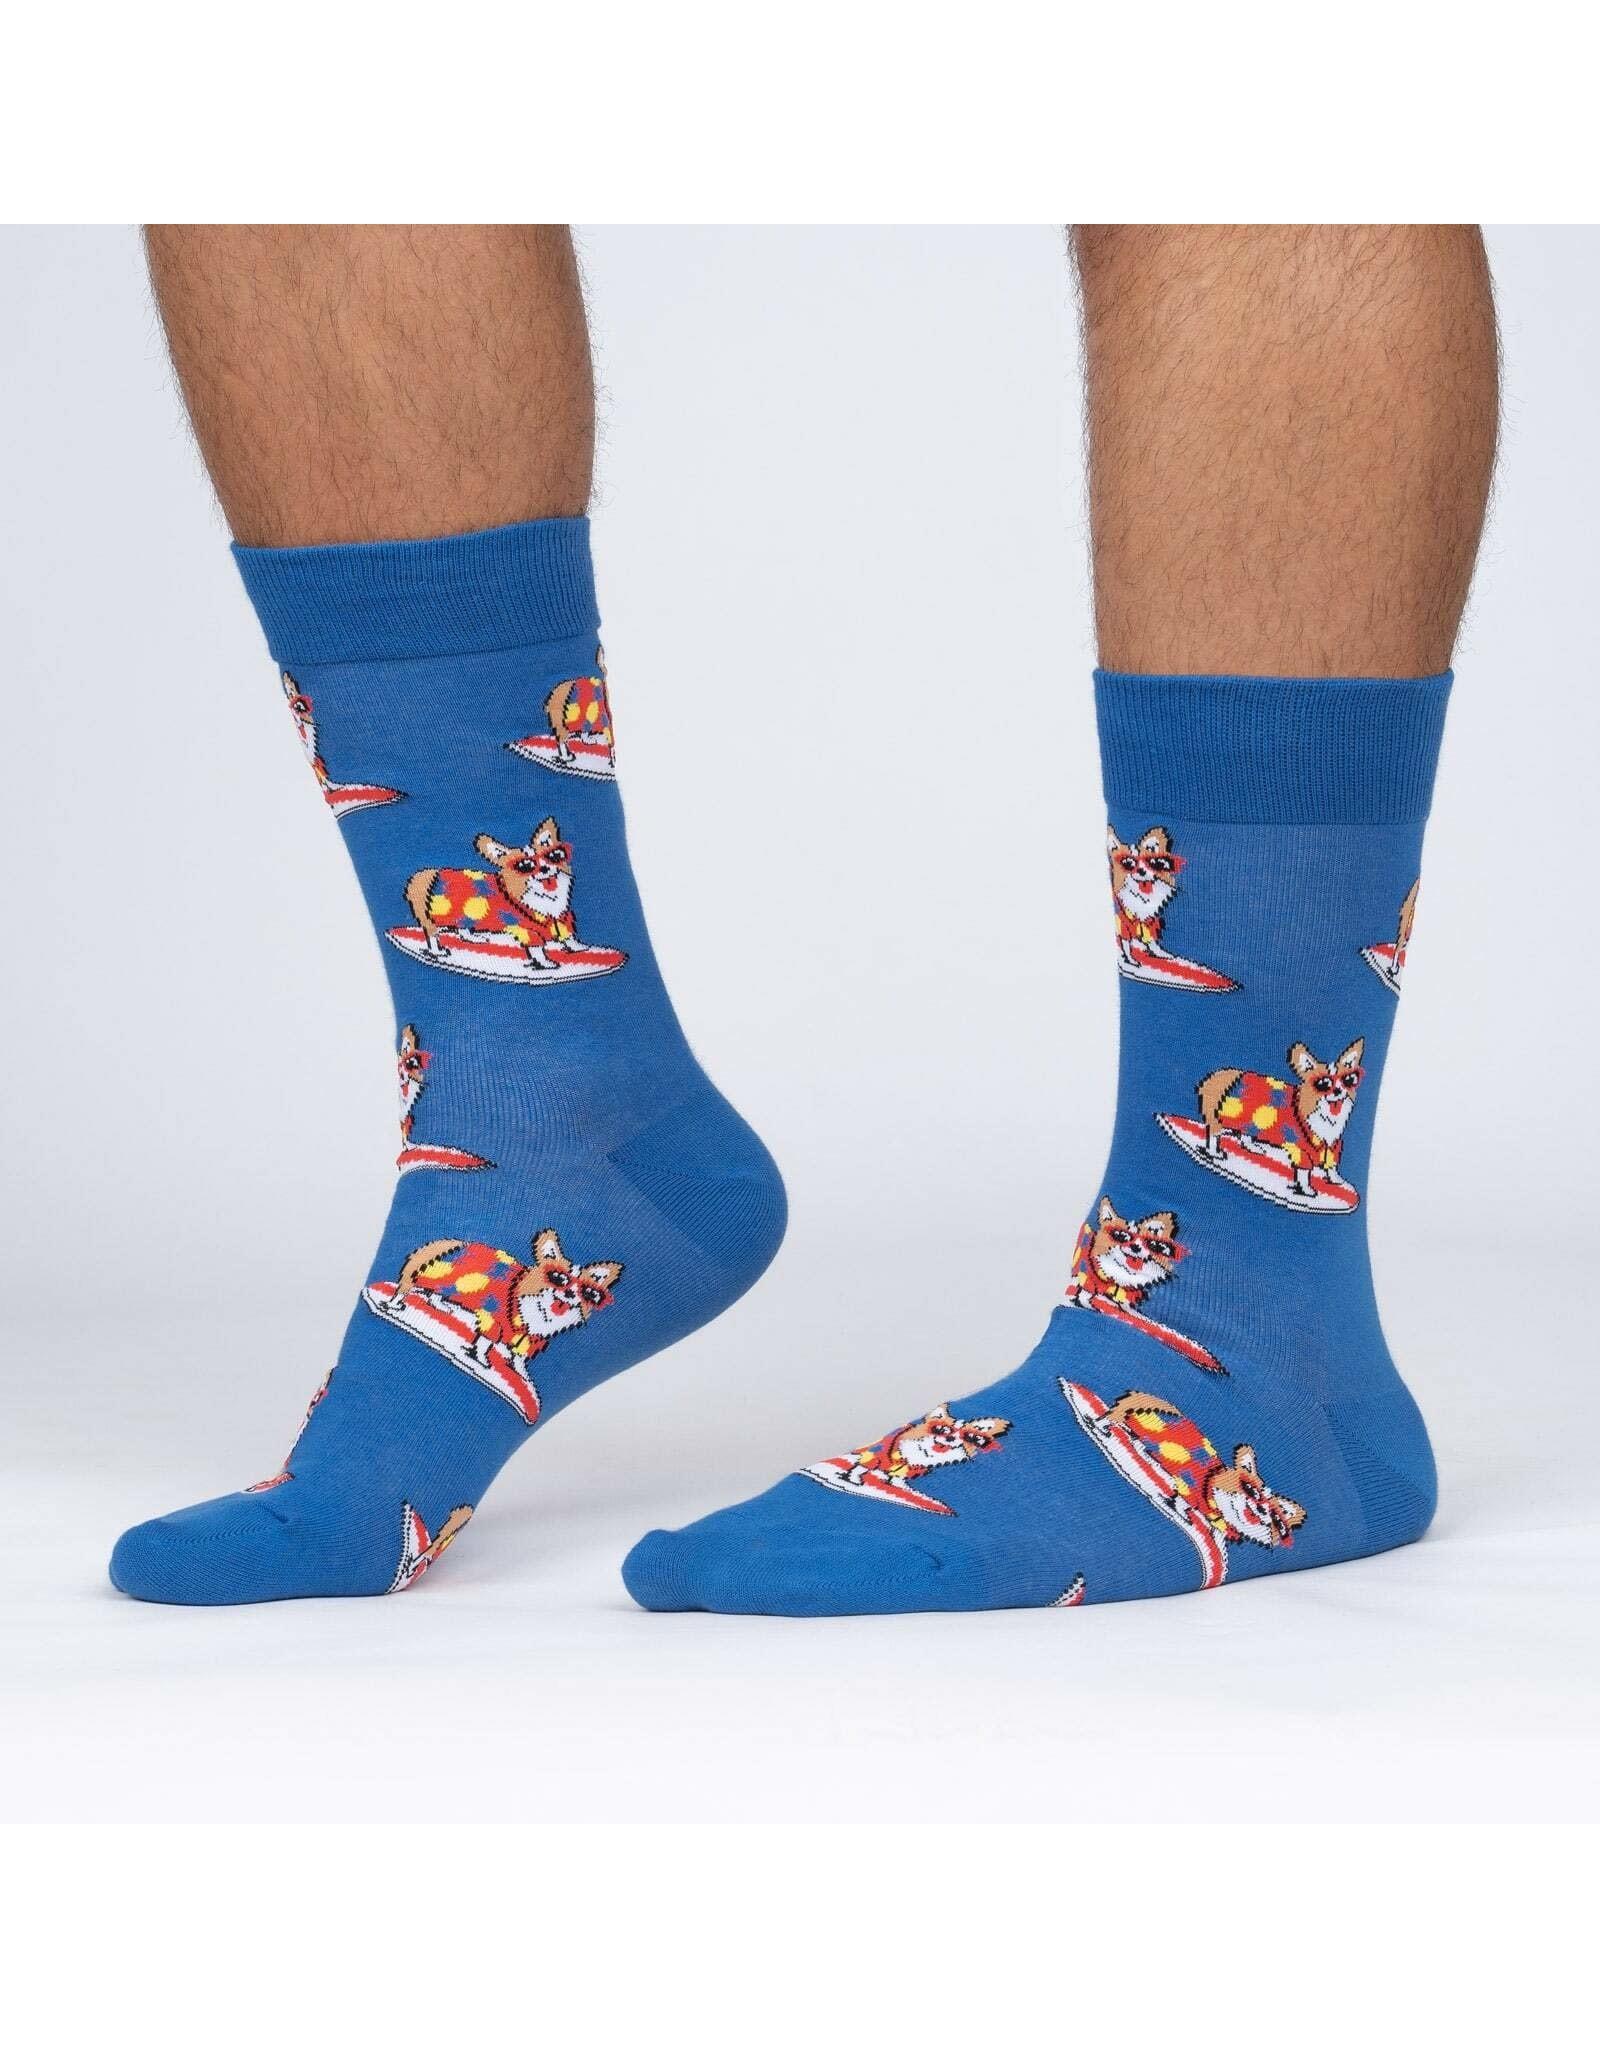 SOCK IT TO ME Copy of - Men's All Eyes On Me Crew Socks